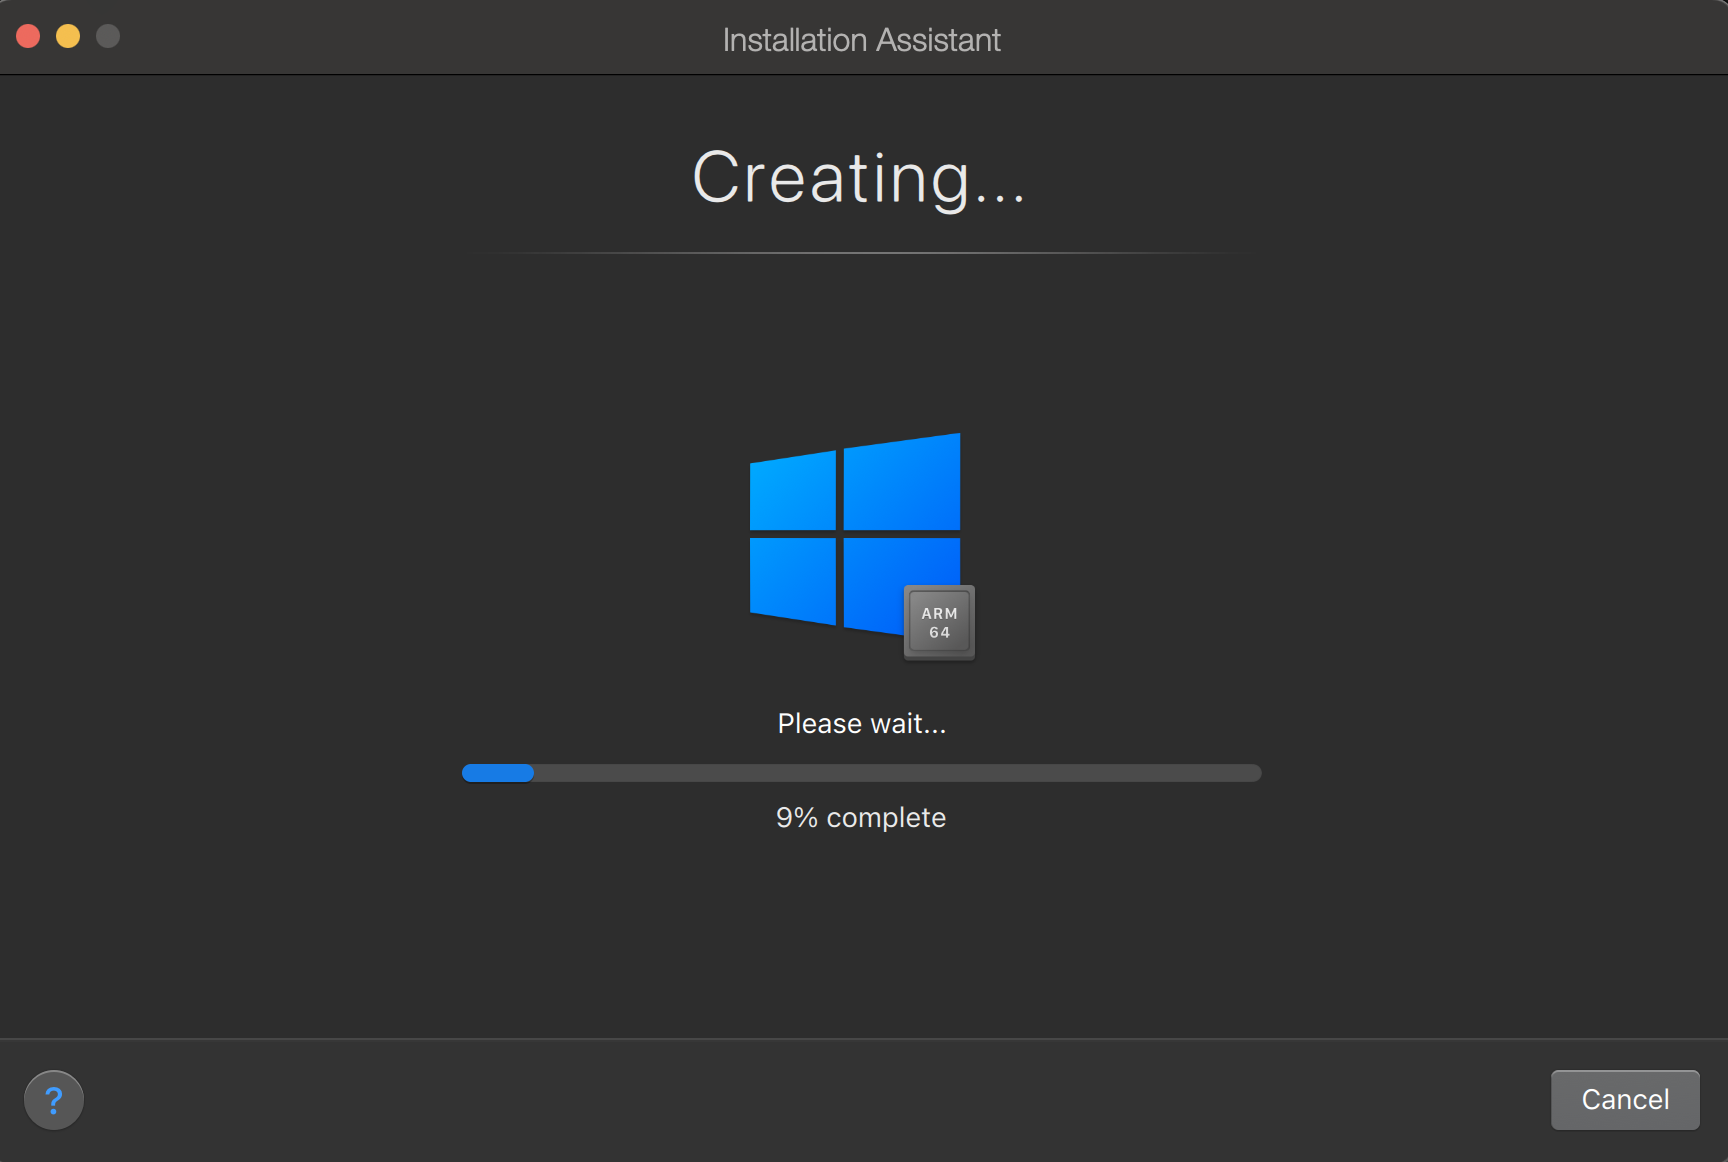 Cài máy ảo Windows 10 trên Macbook M1 bằng Parallels Desktop free